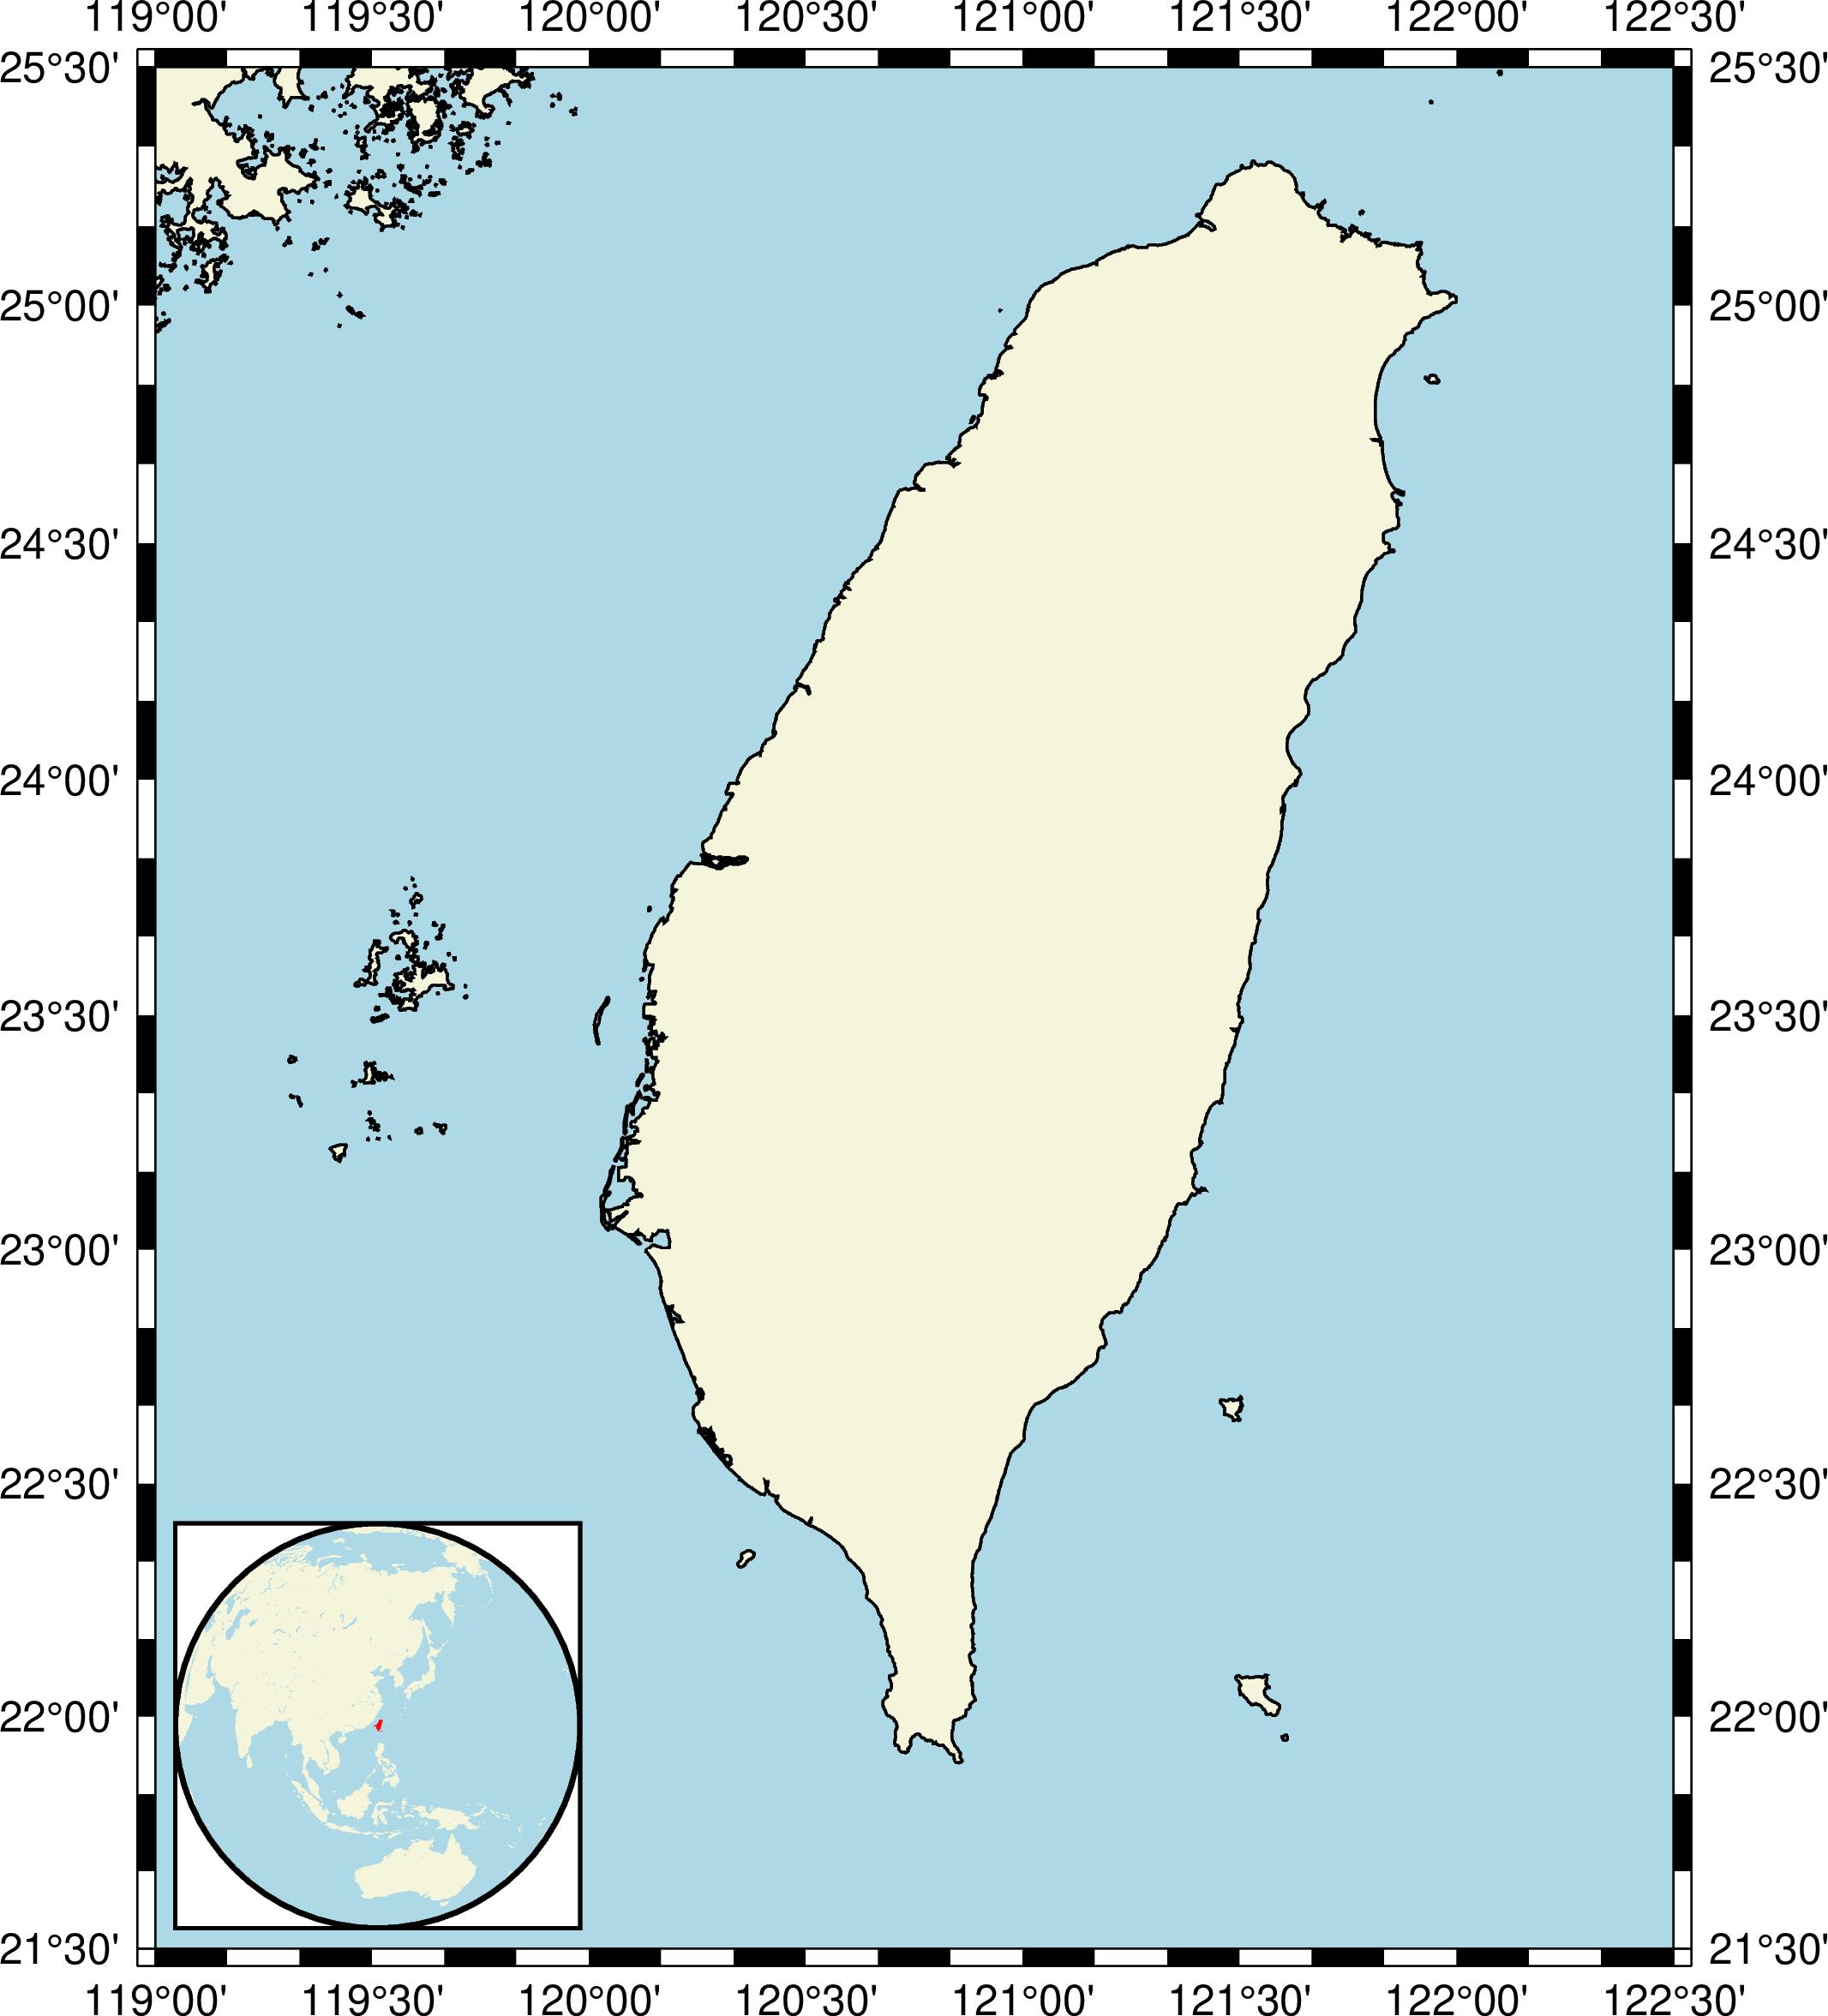 taiwan basemap with frame